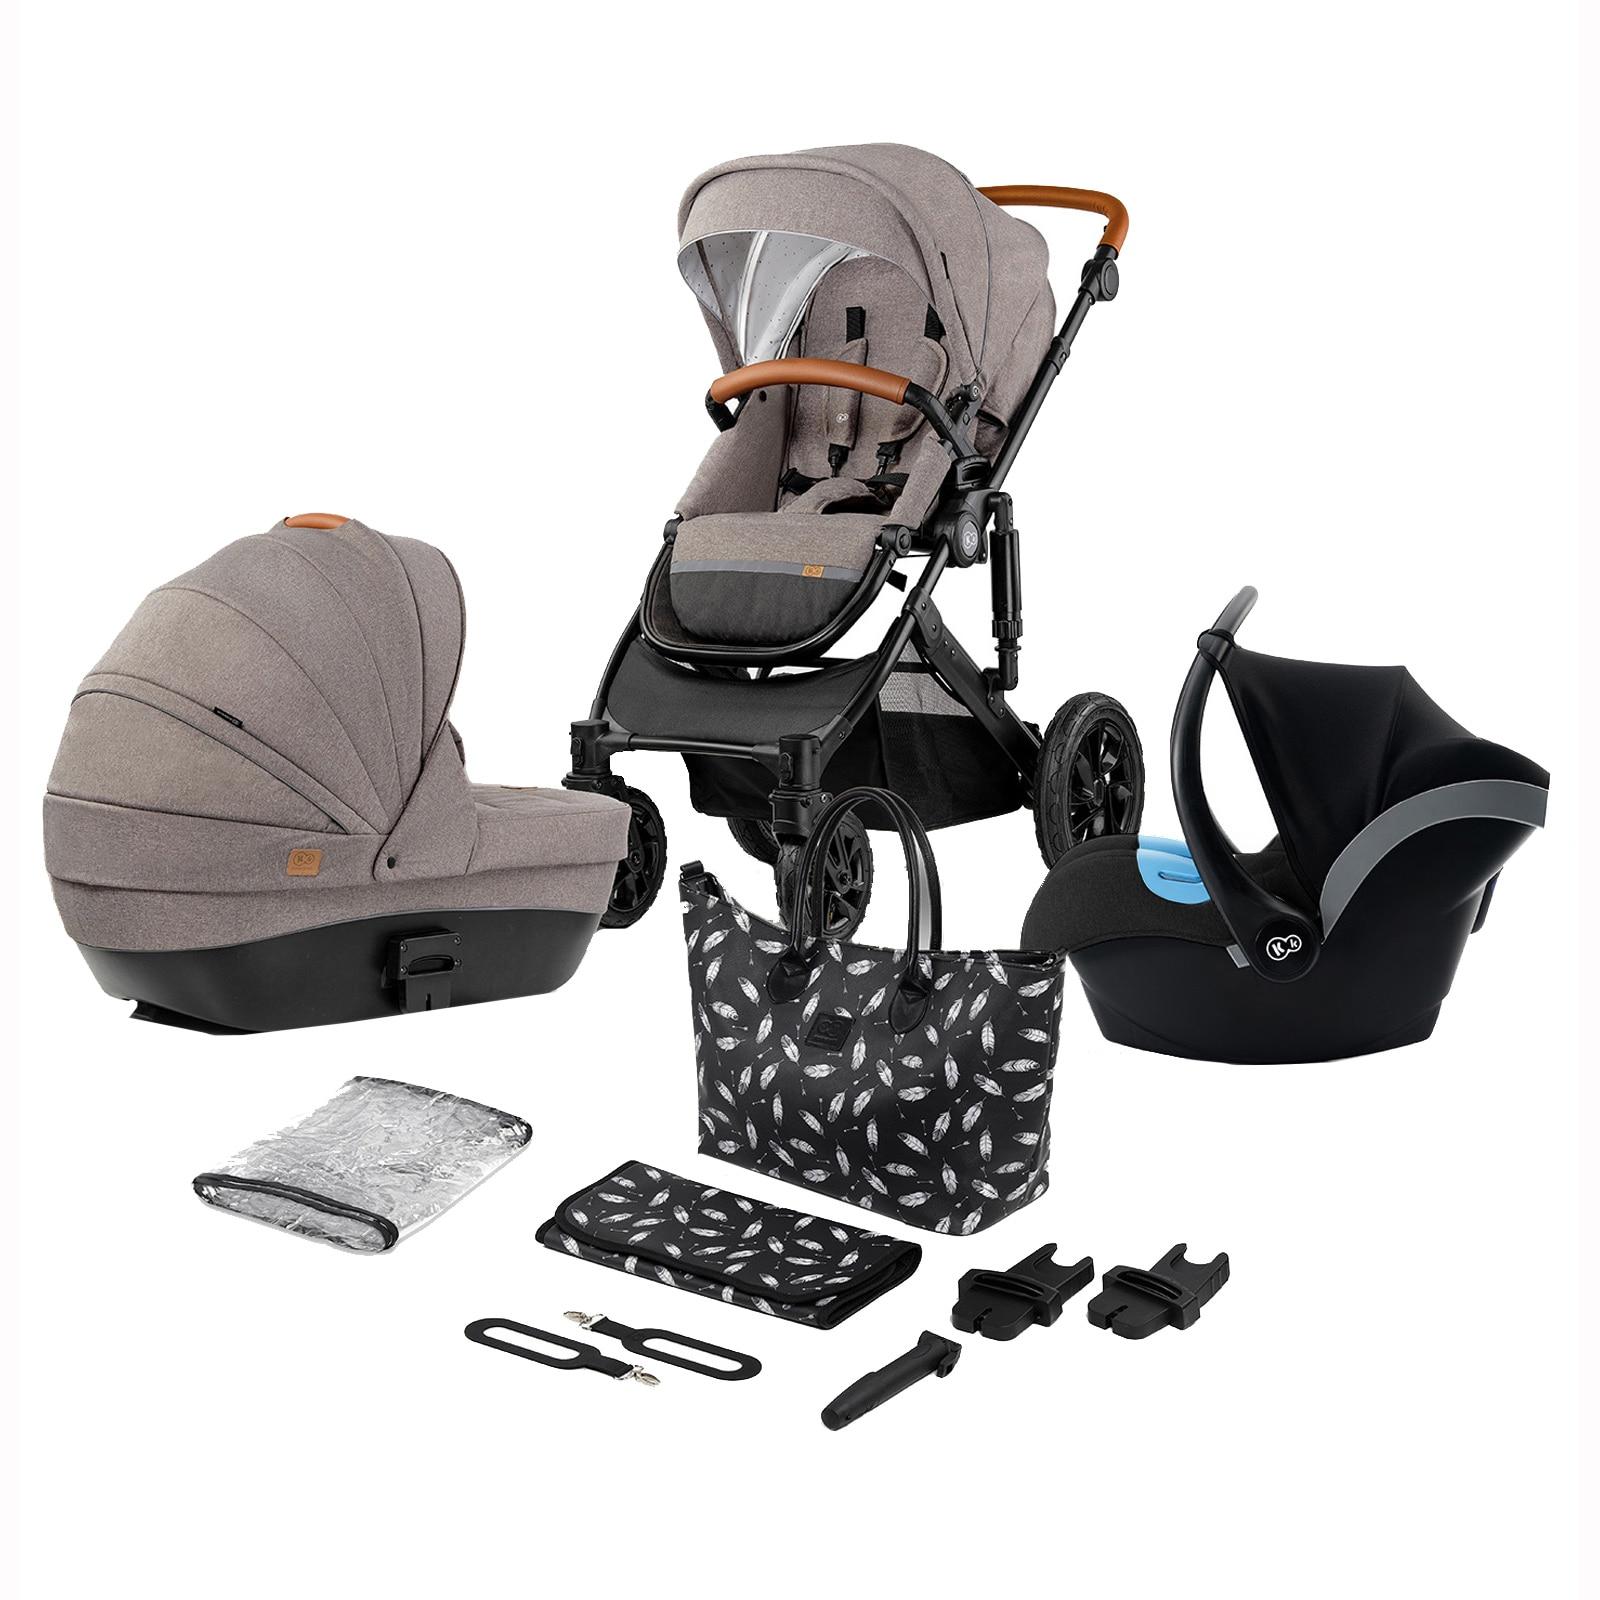 Fotografie Carucior Kinderkraft 3 in 1 Prime 2020 cu cos auto, accesorii si geanta, Bej